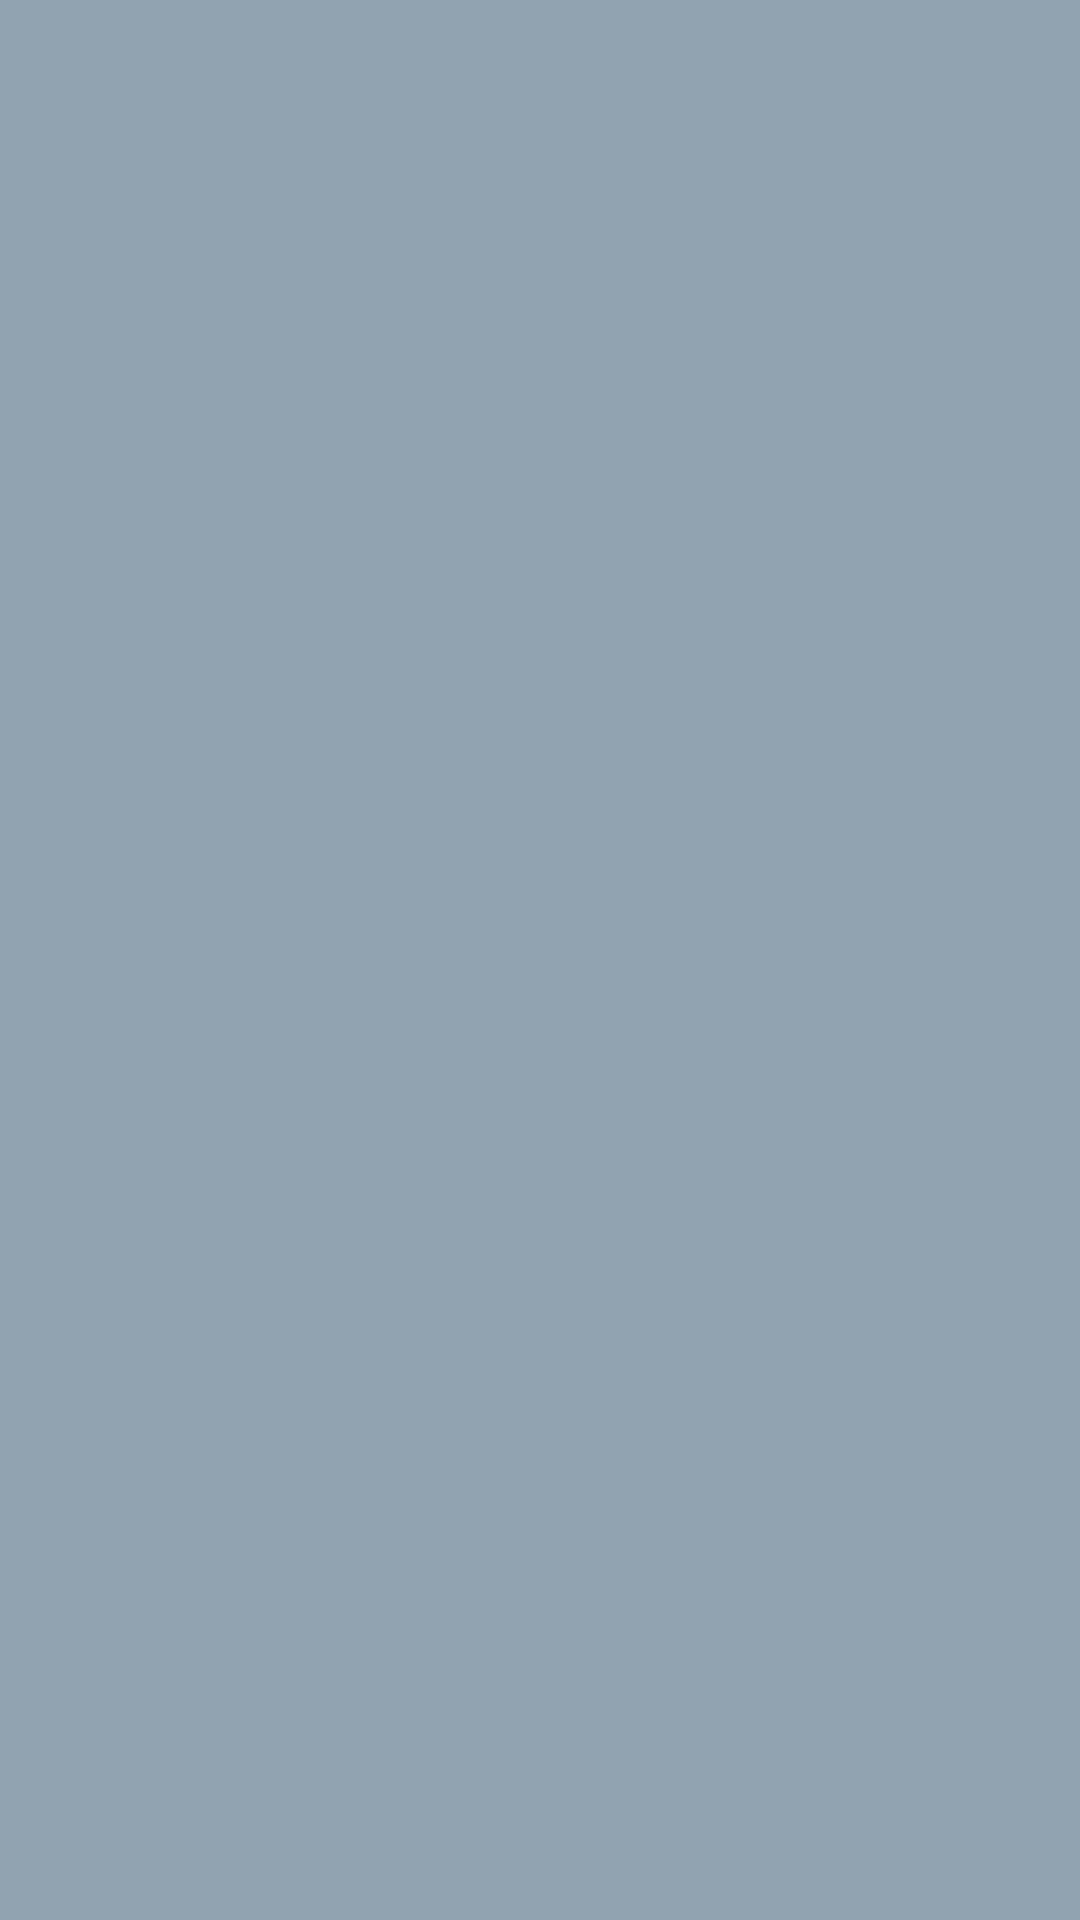 1080x1920 Cadet Grey Solid Color Background